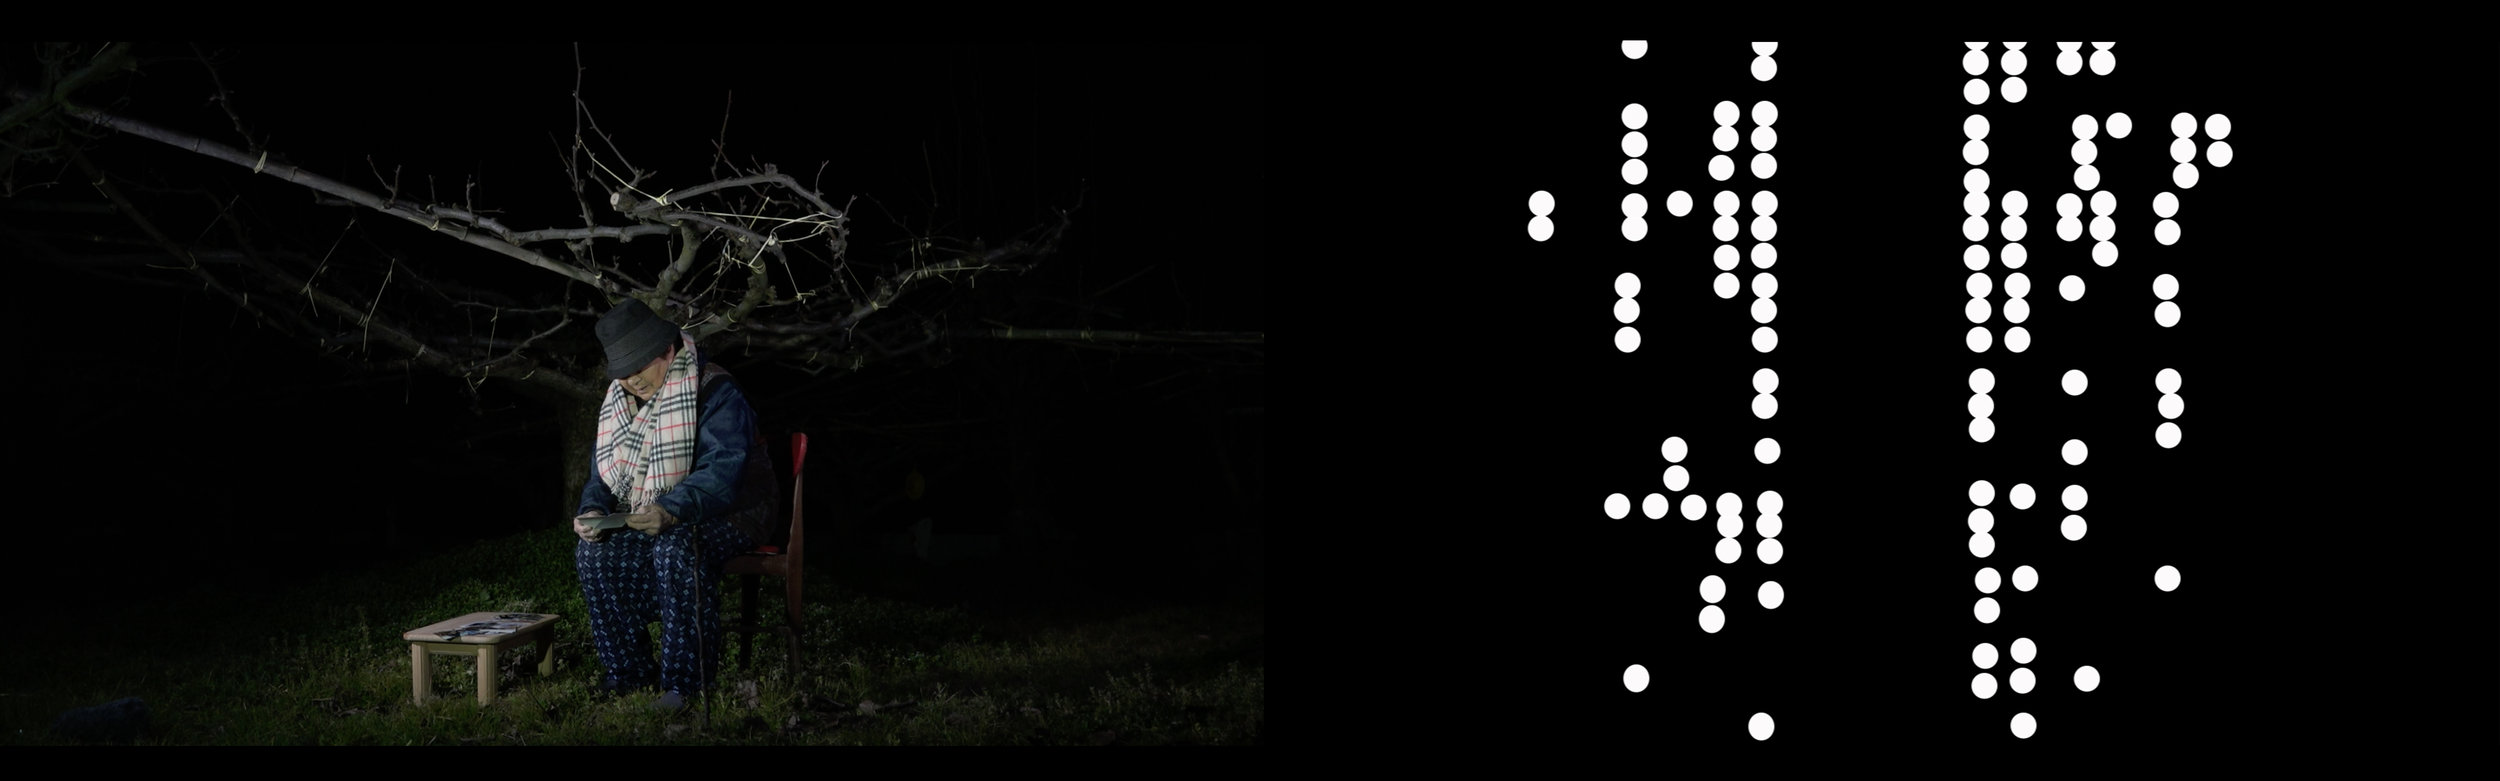 <平成三十一年二月秋芳梨樹> 雙頻道影片  <Syuho Pear Tree in Heisei 31th, February.> 2-Channel Videos.